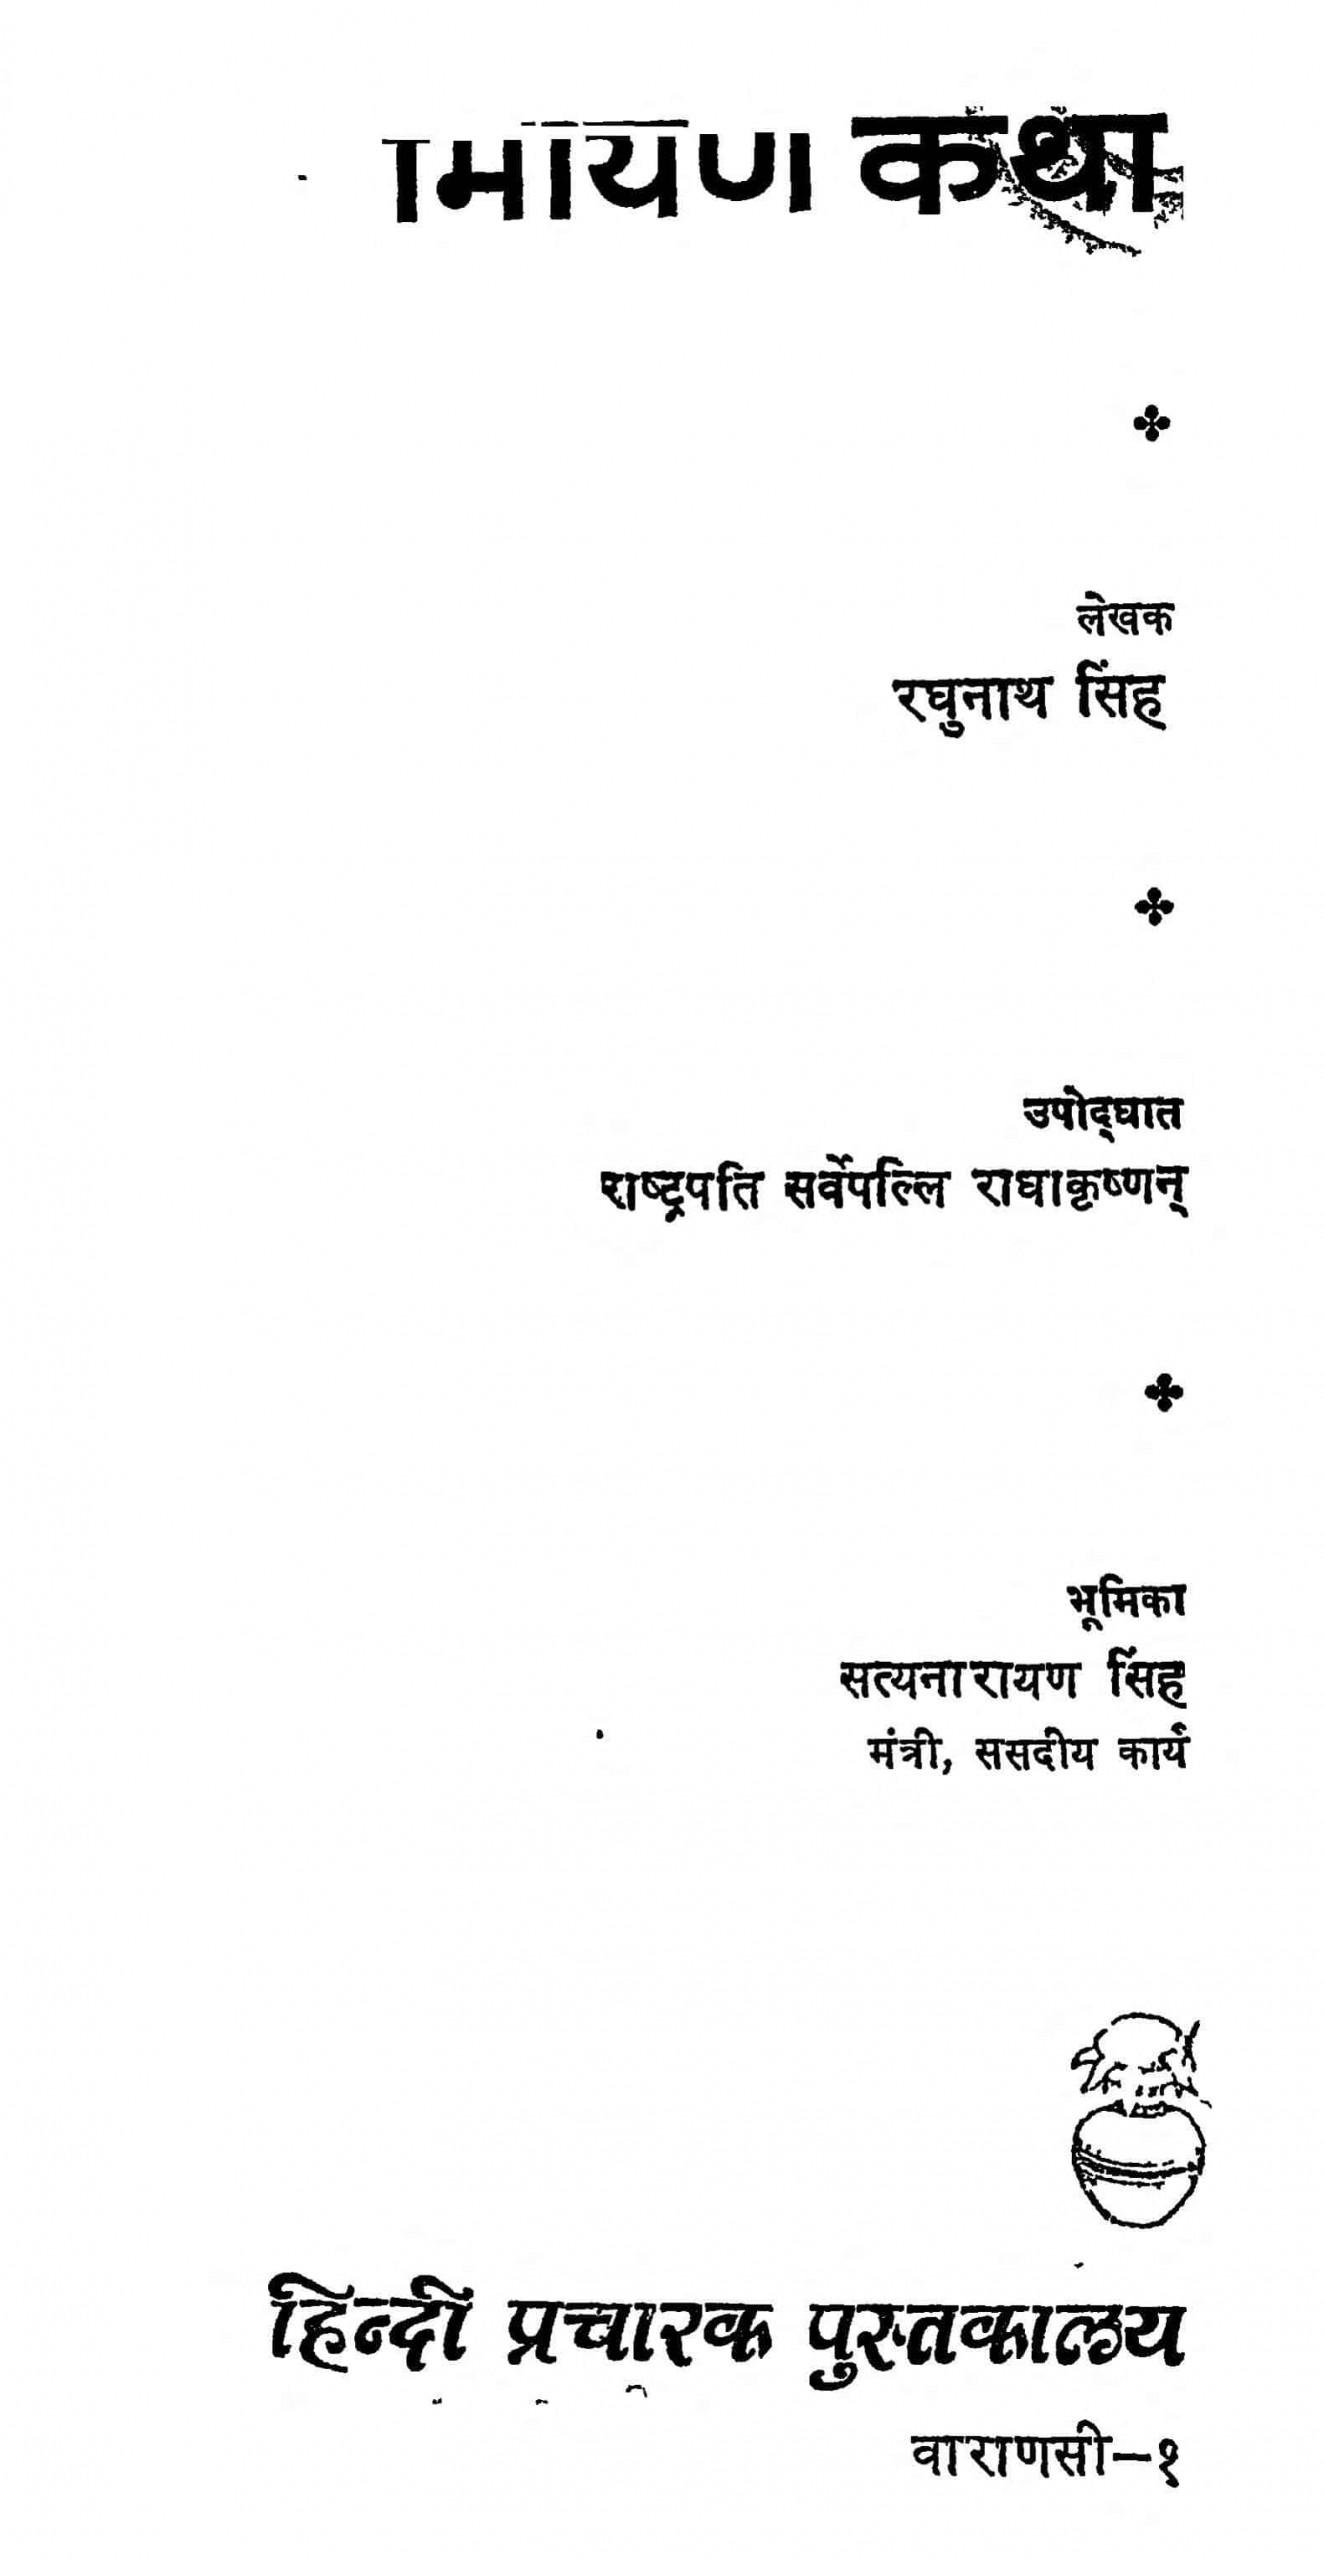 Book Image : रामायण कथा - Ramayan Katha